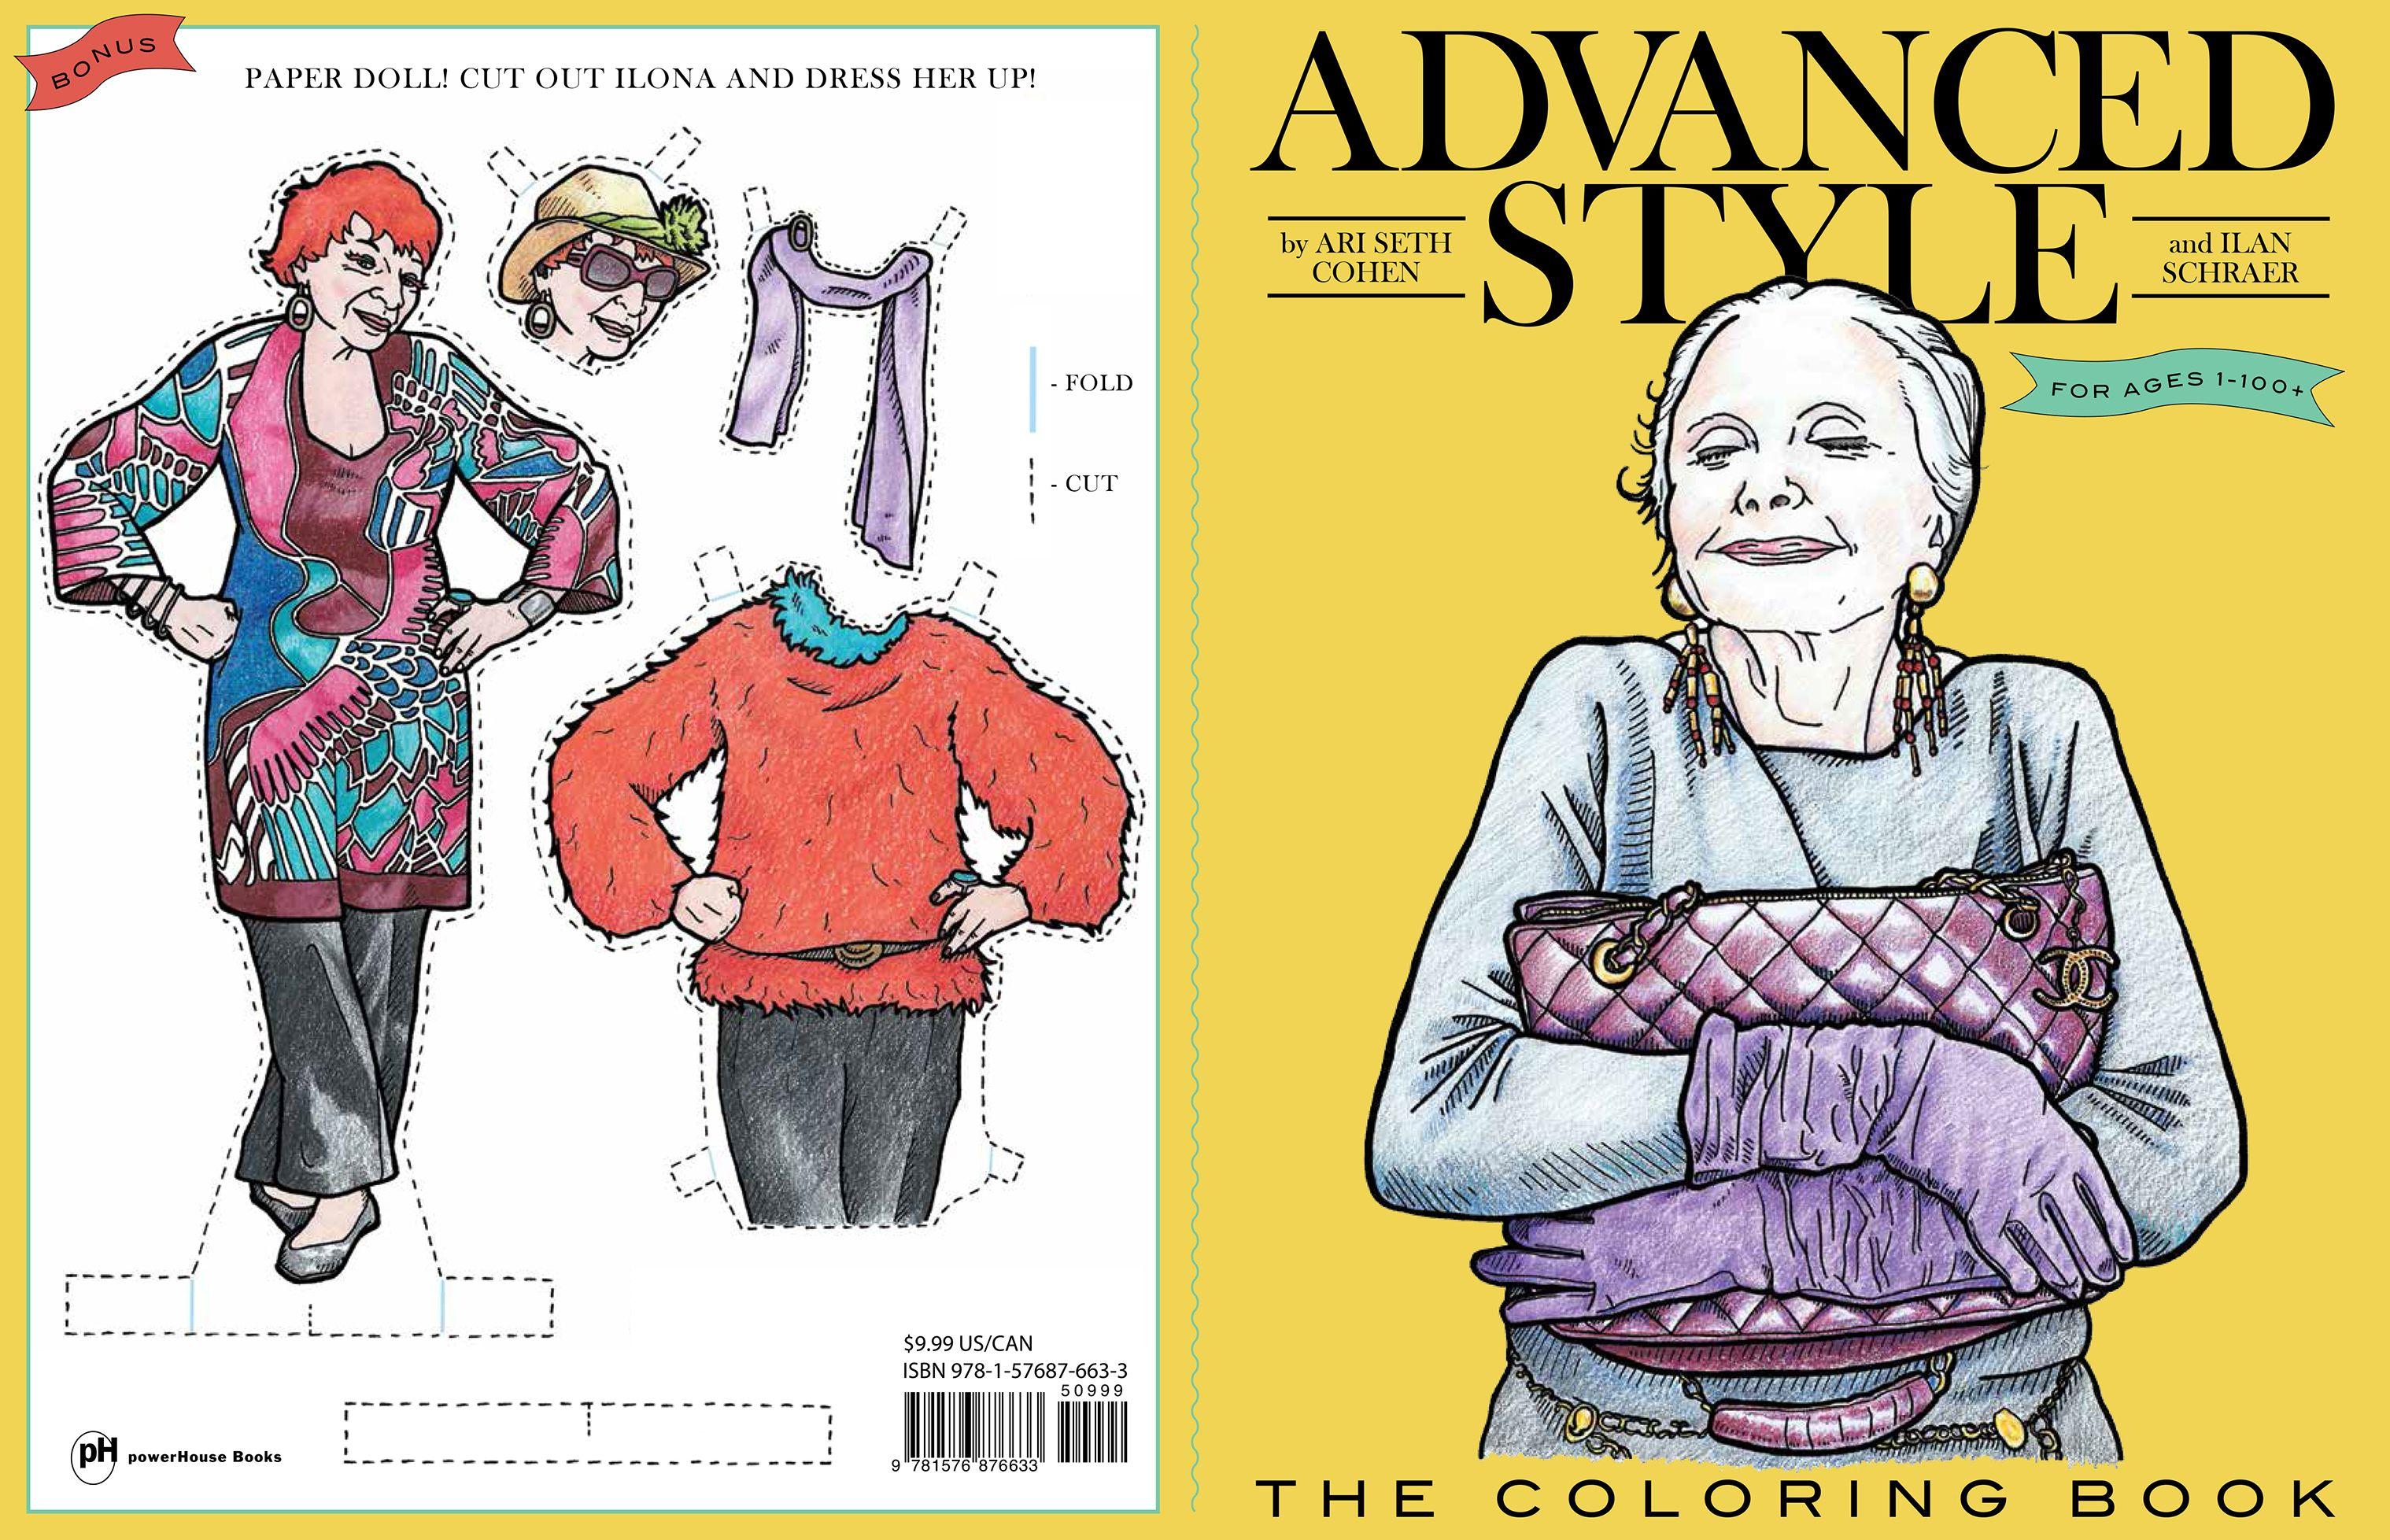 Pin by Ari Seth Cohen on Advanced Style | Pinterest | Advanced style ...